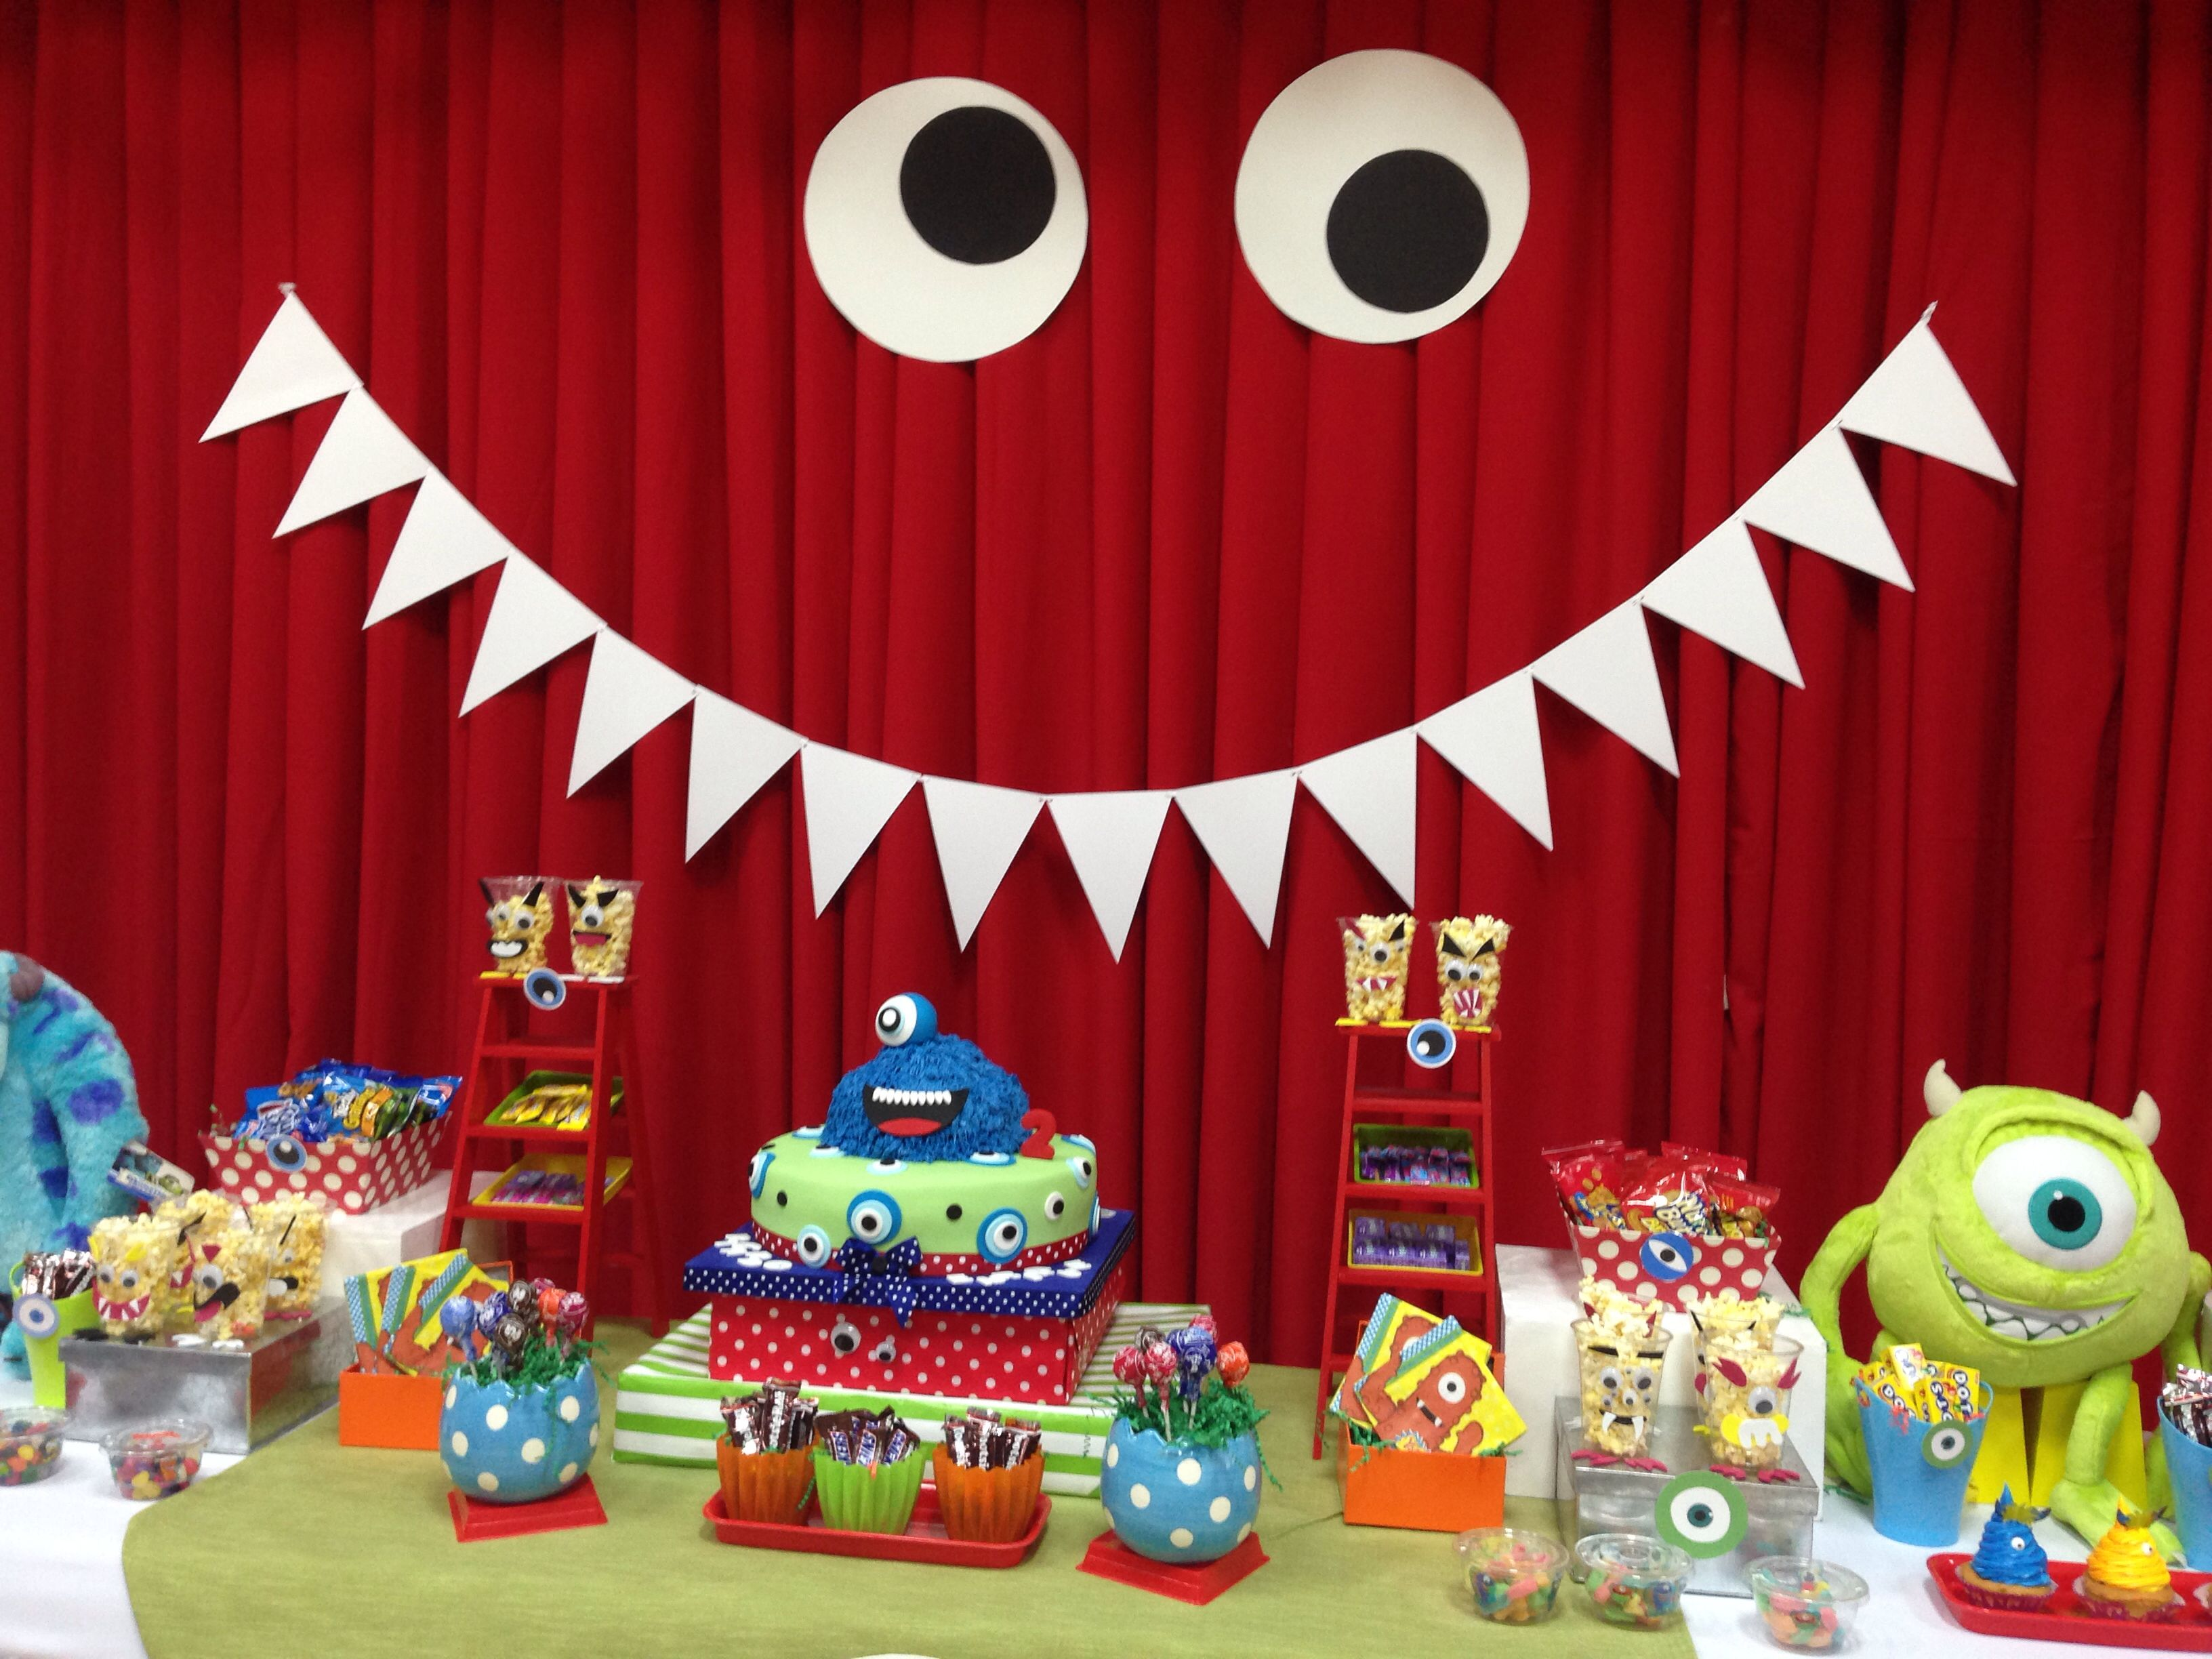 Little Monster Party Decor